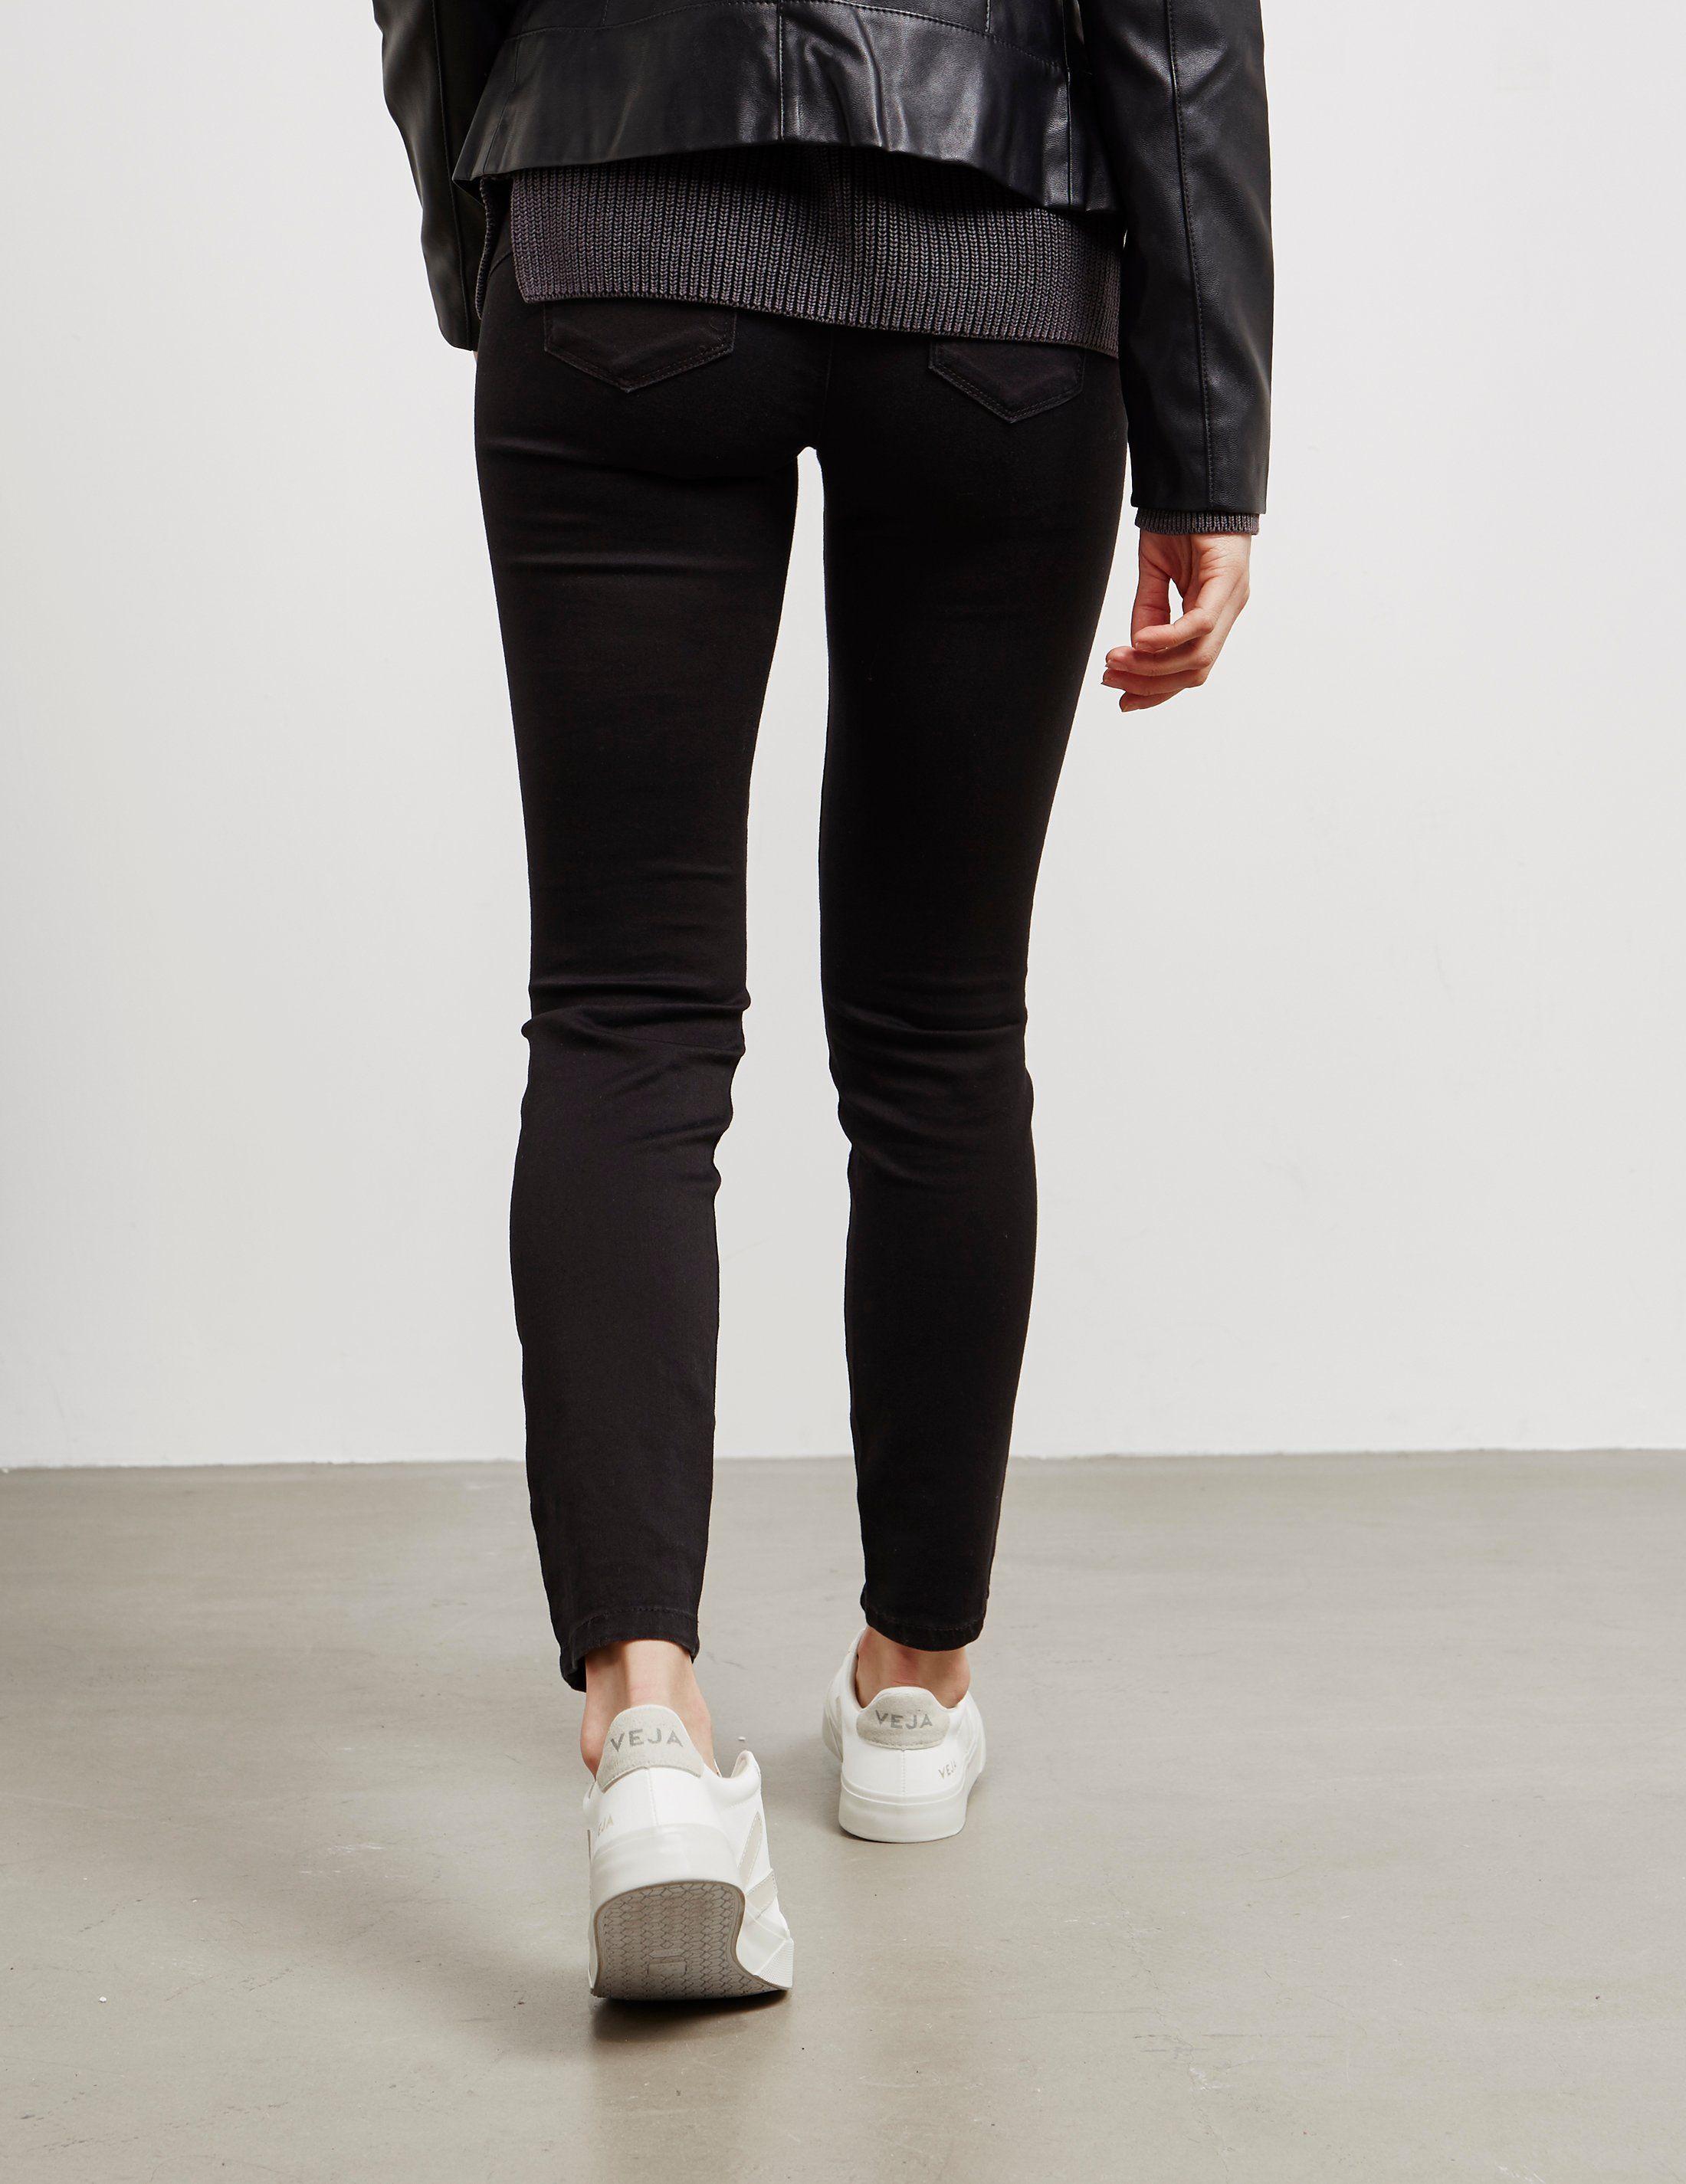 Armani Exchange J69 Lift Up Jeans - Online Exclusive